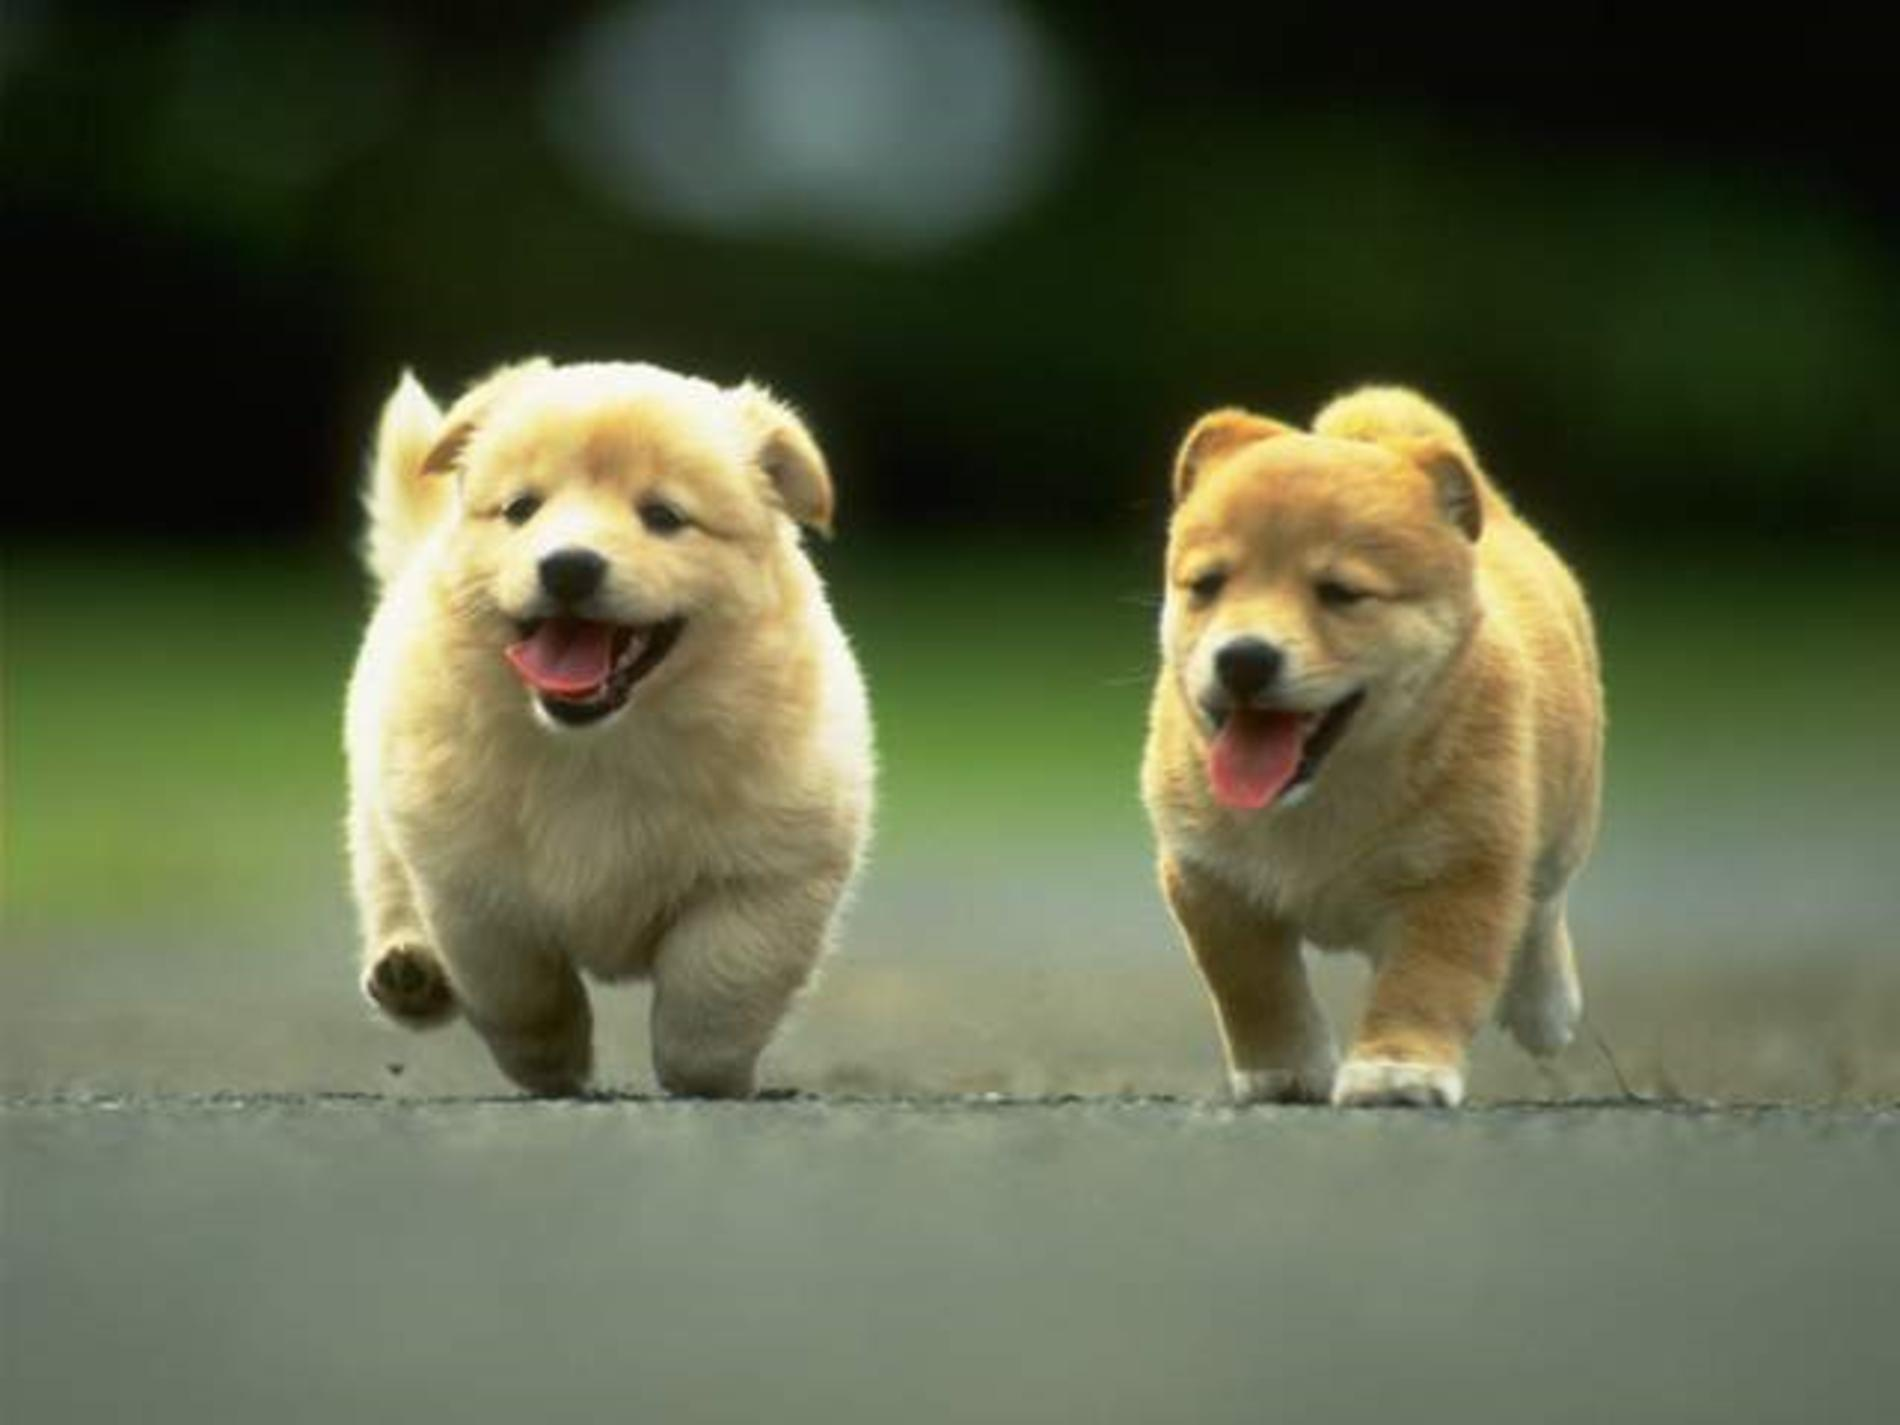 Kintamani Puppies: Kintamani Running Kintamani Puppies Breed